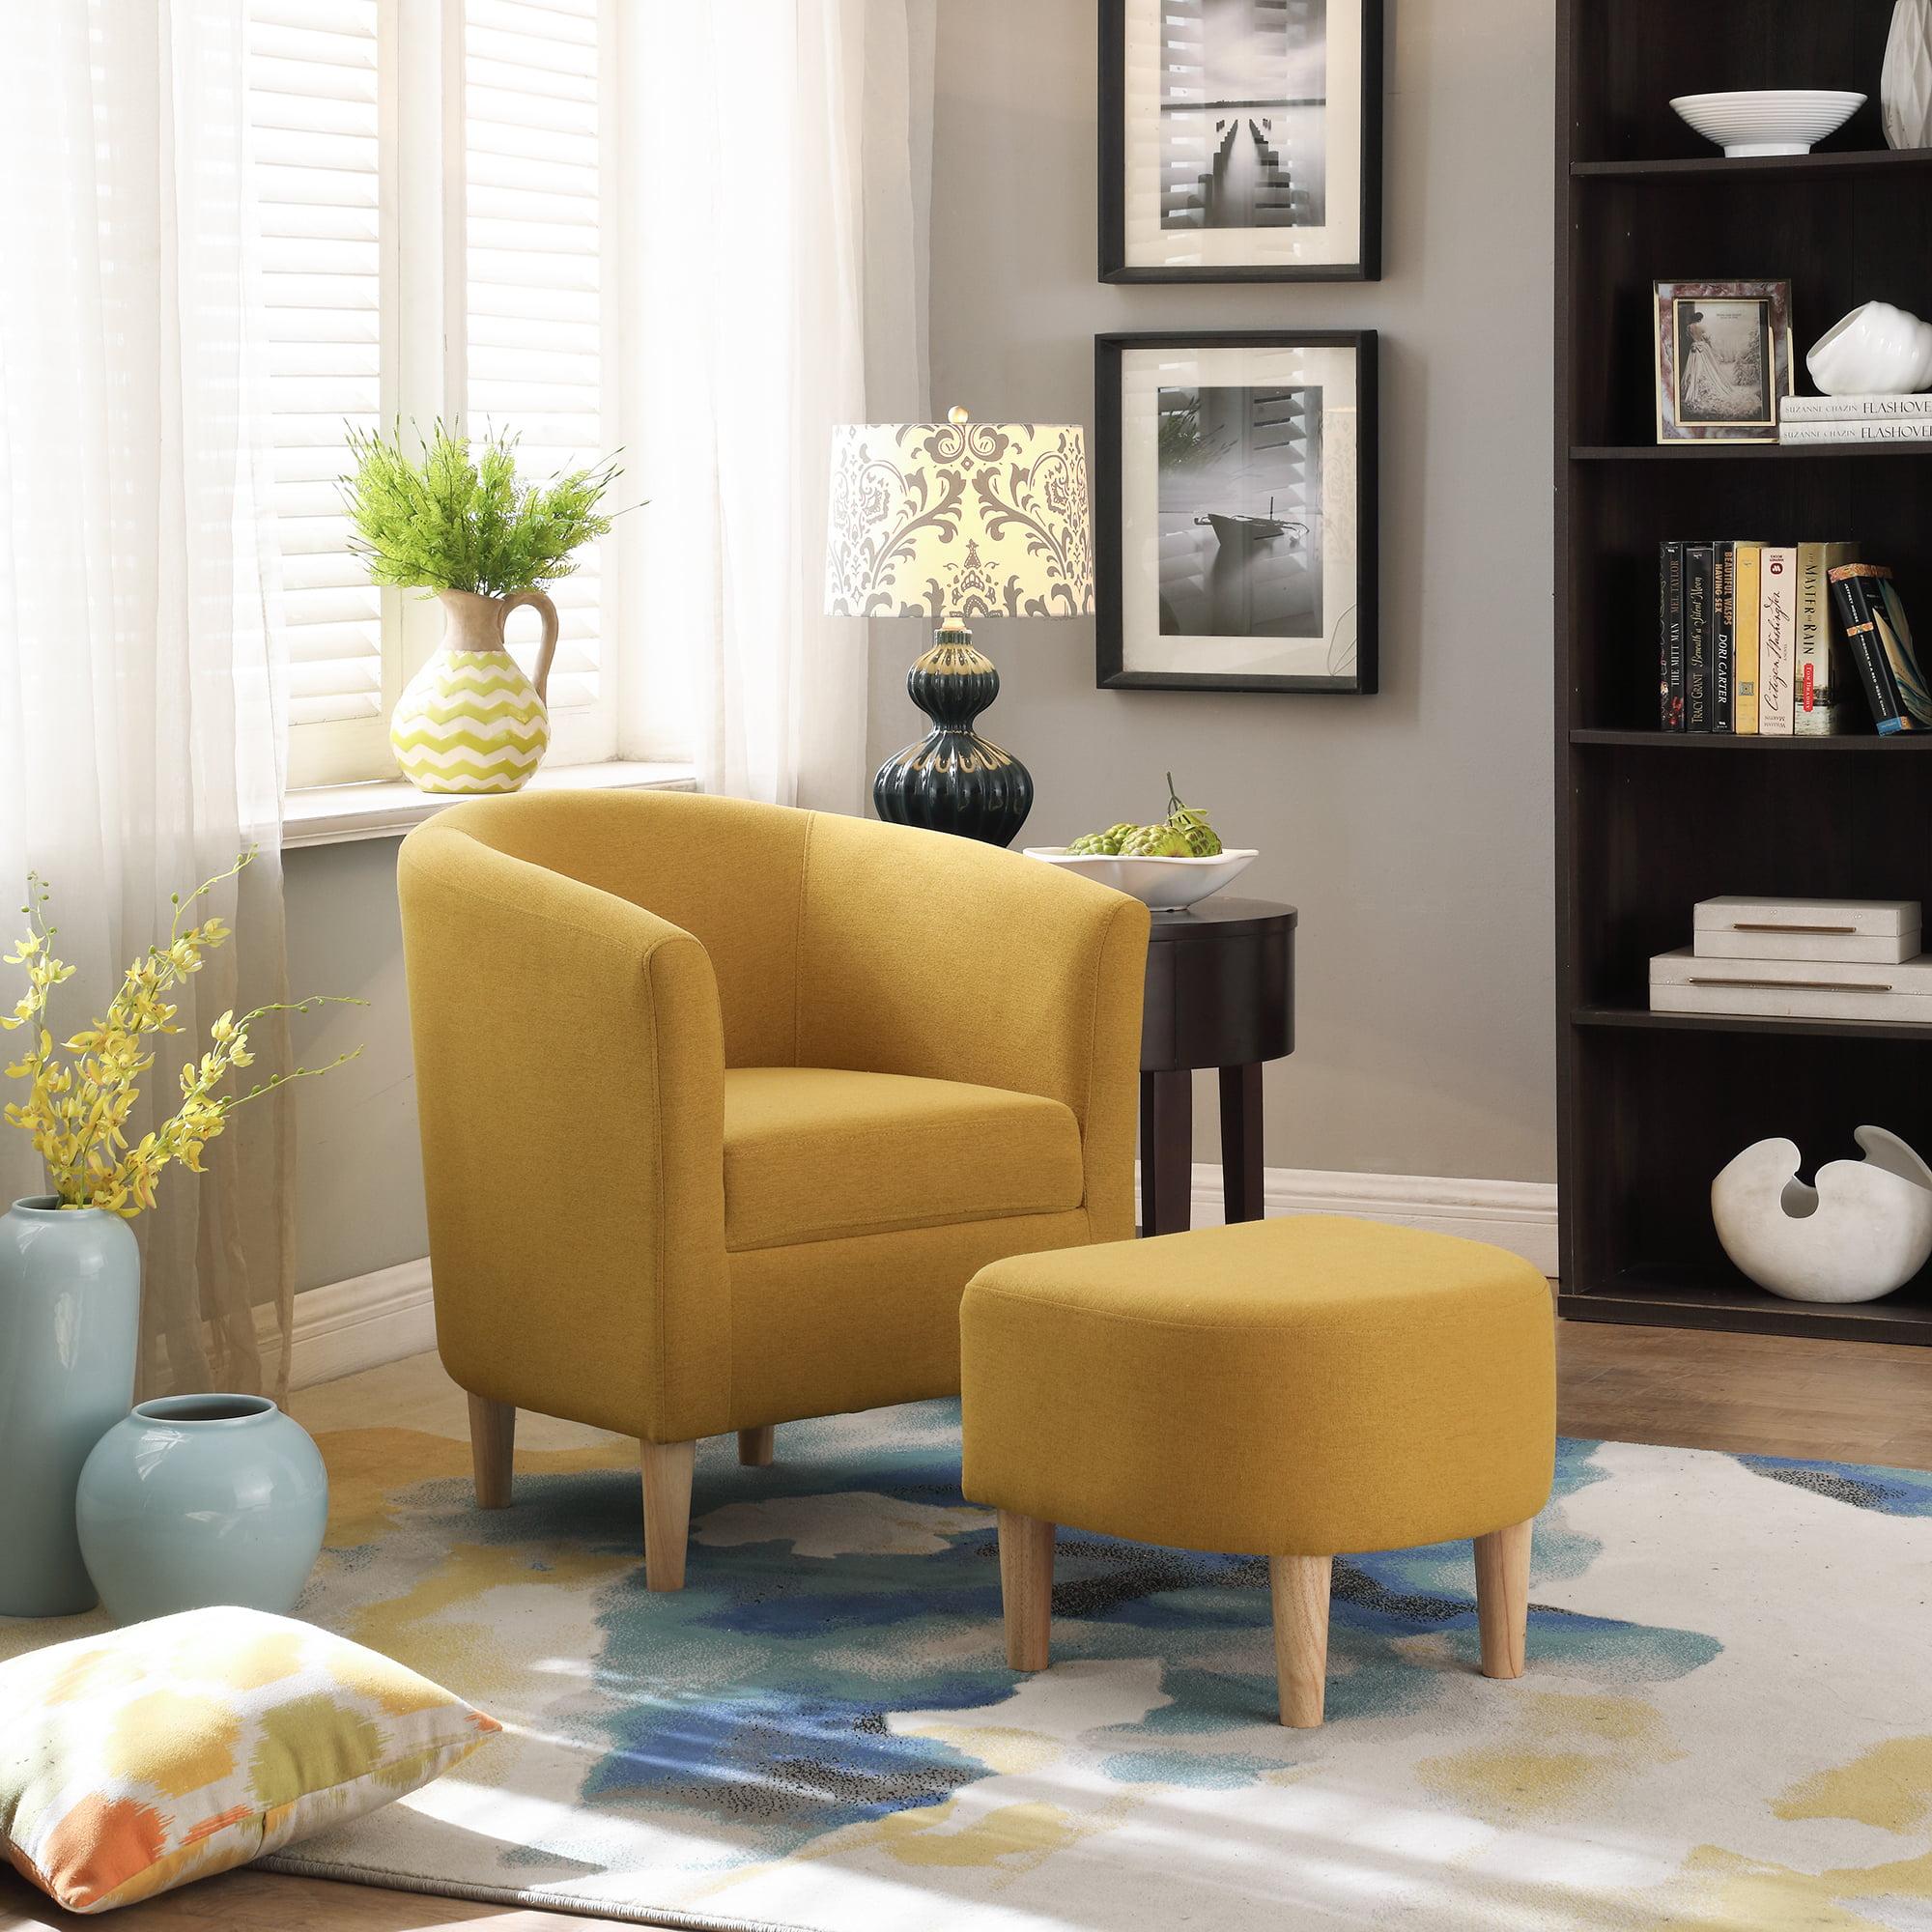 2020 Modern Accent ArmChair Living Room Fabric Single Sofa Wood Leg With Cushion